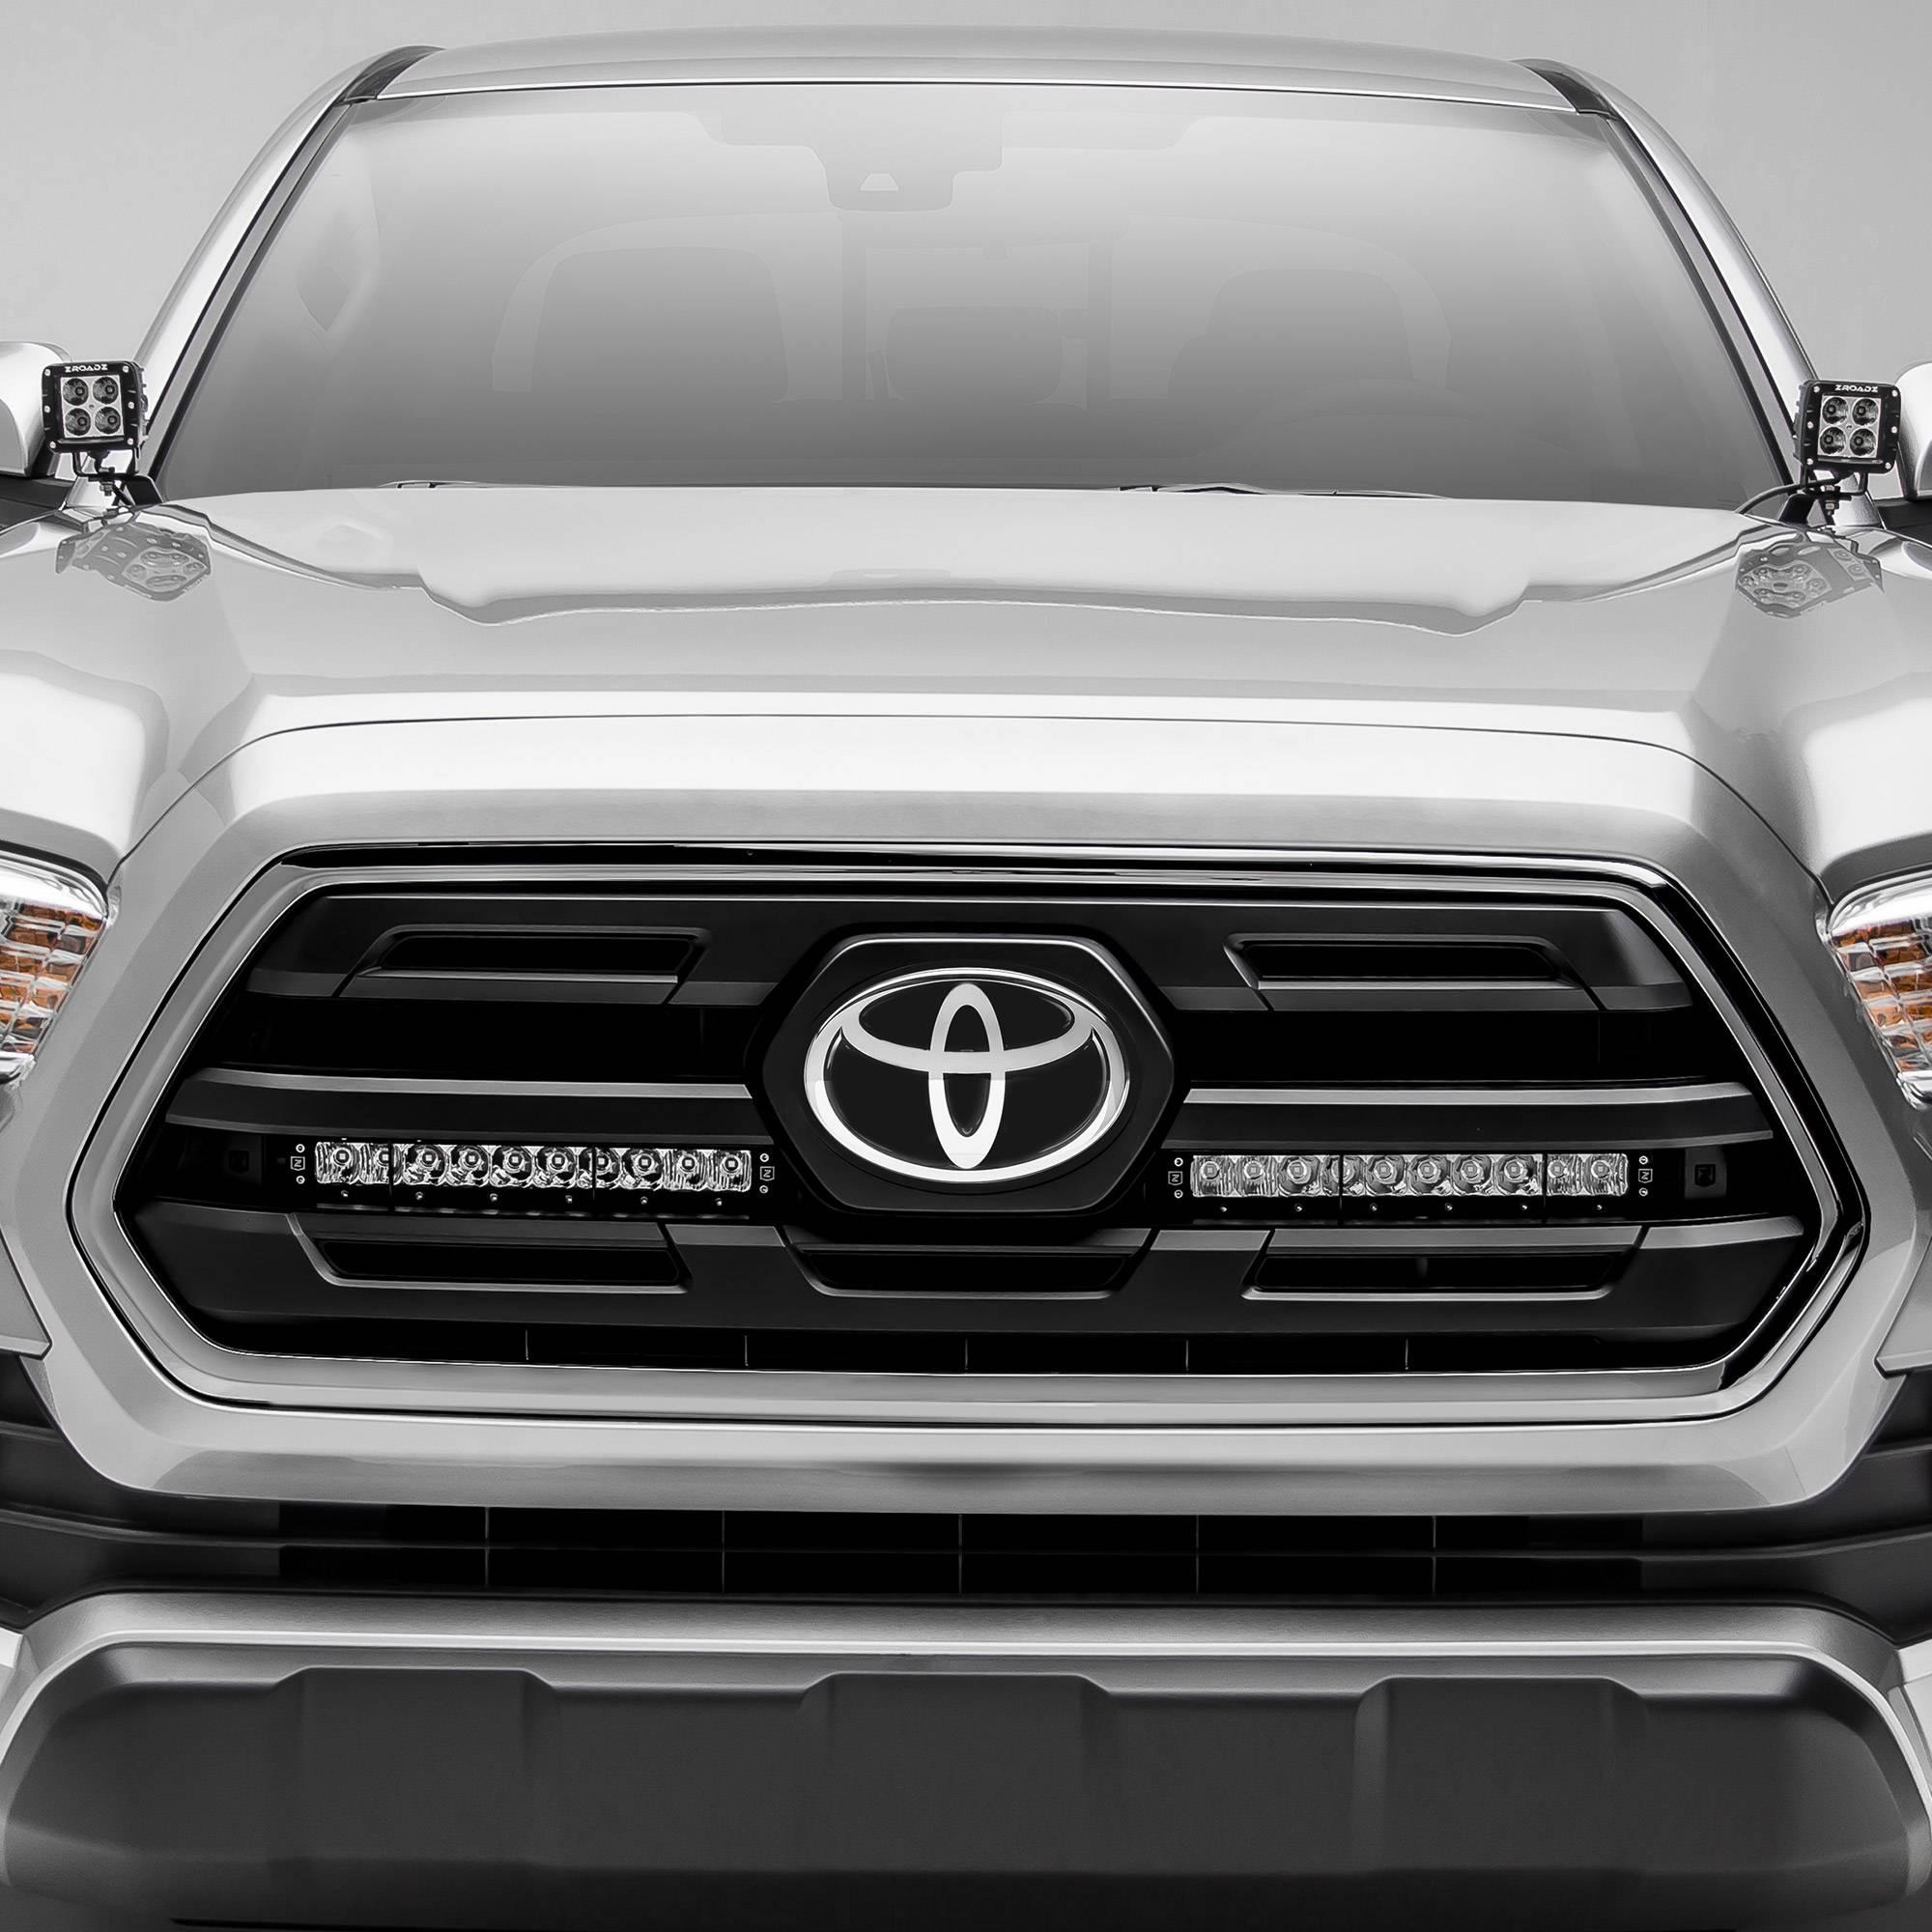 ZROADZ                                             - 2018-2019 Toyota Tacoma OEM Grille LED Kit with (2) 10 Inch LED Single Row Slim Light Bars - PN #Z419611-KIT